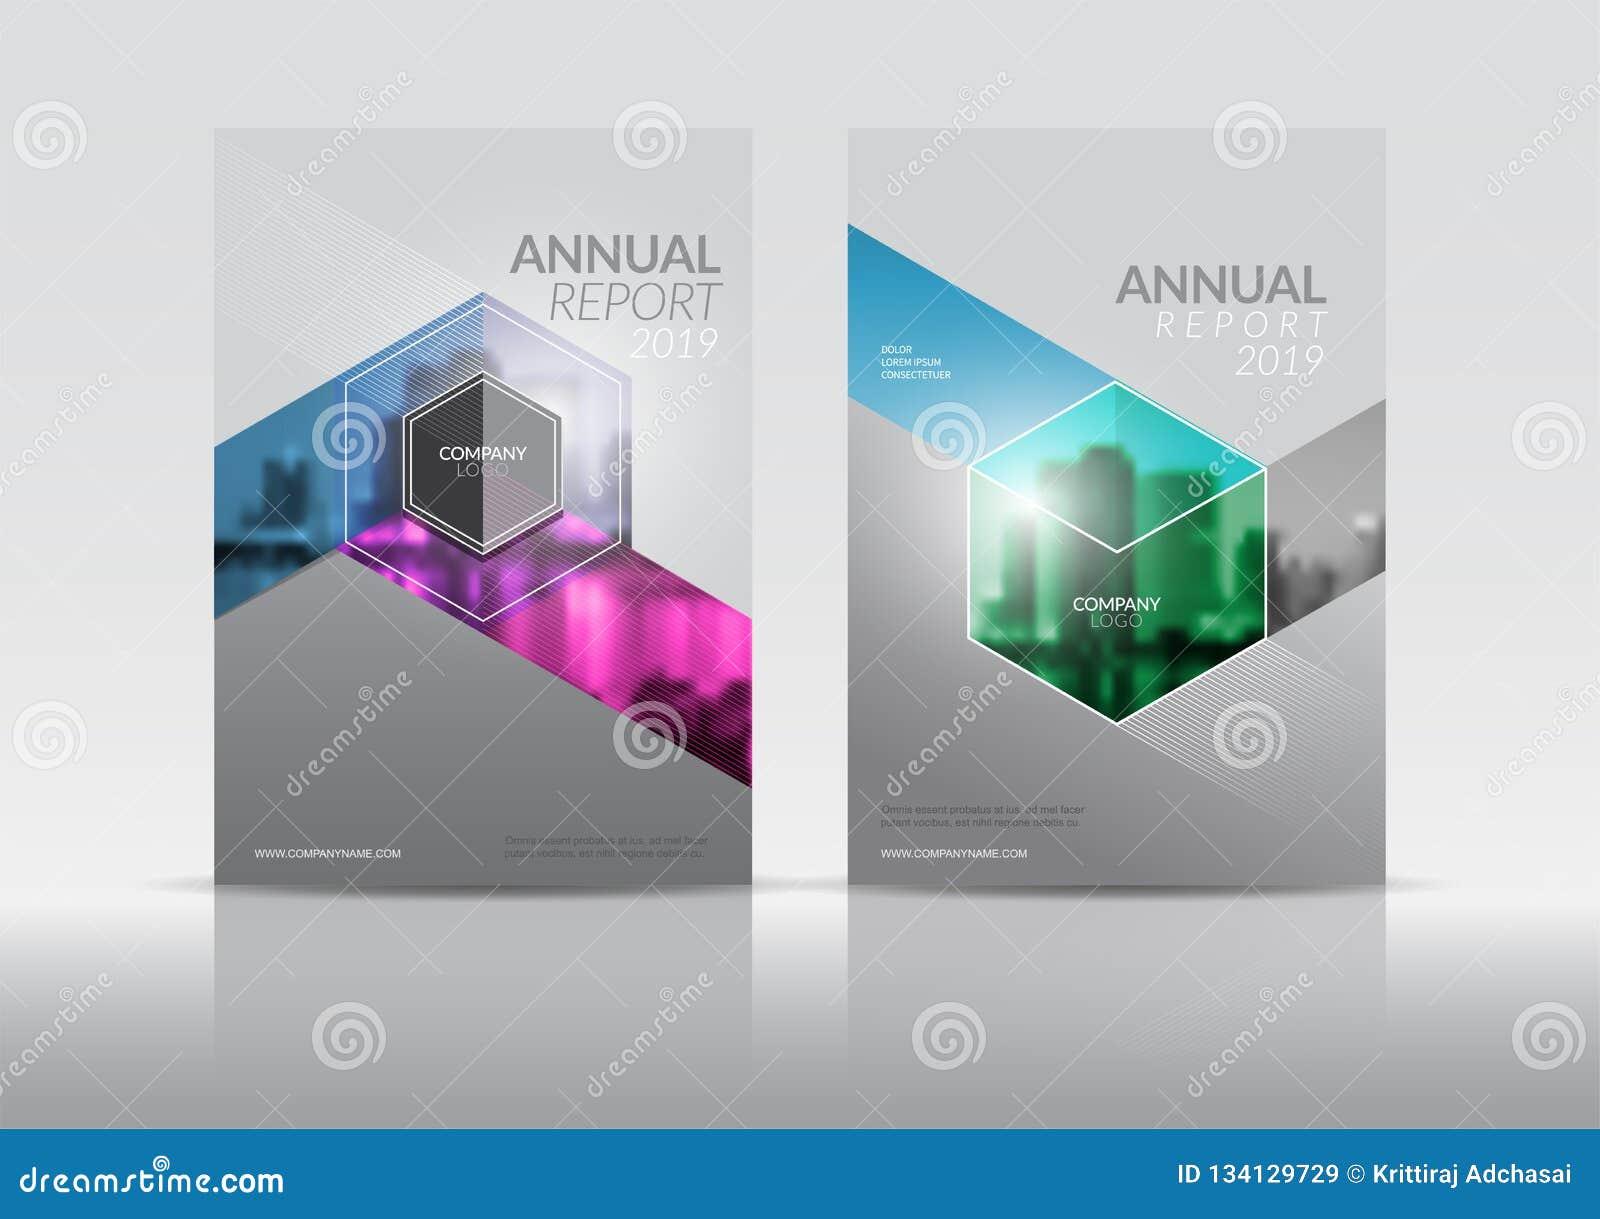 cover design template  annual report cover  flyer  presentation  brochure stock illustration